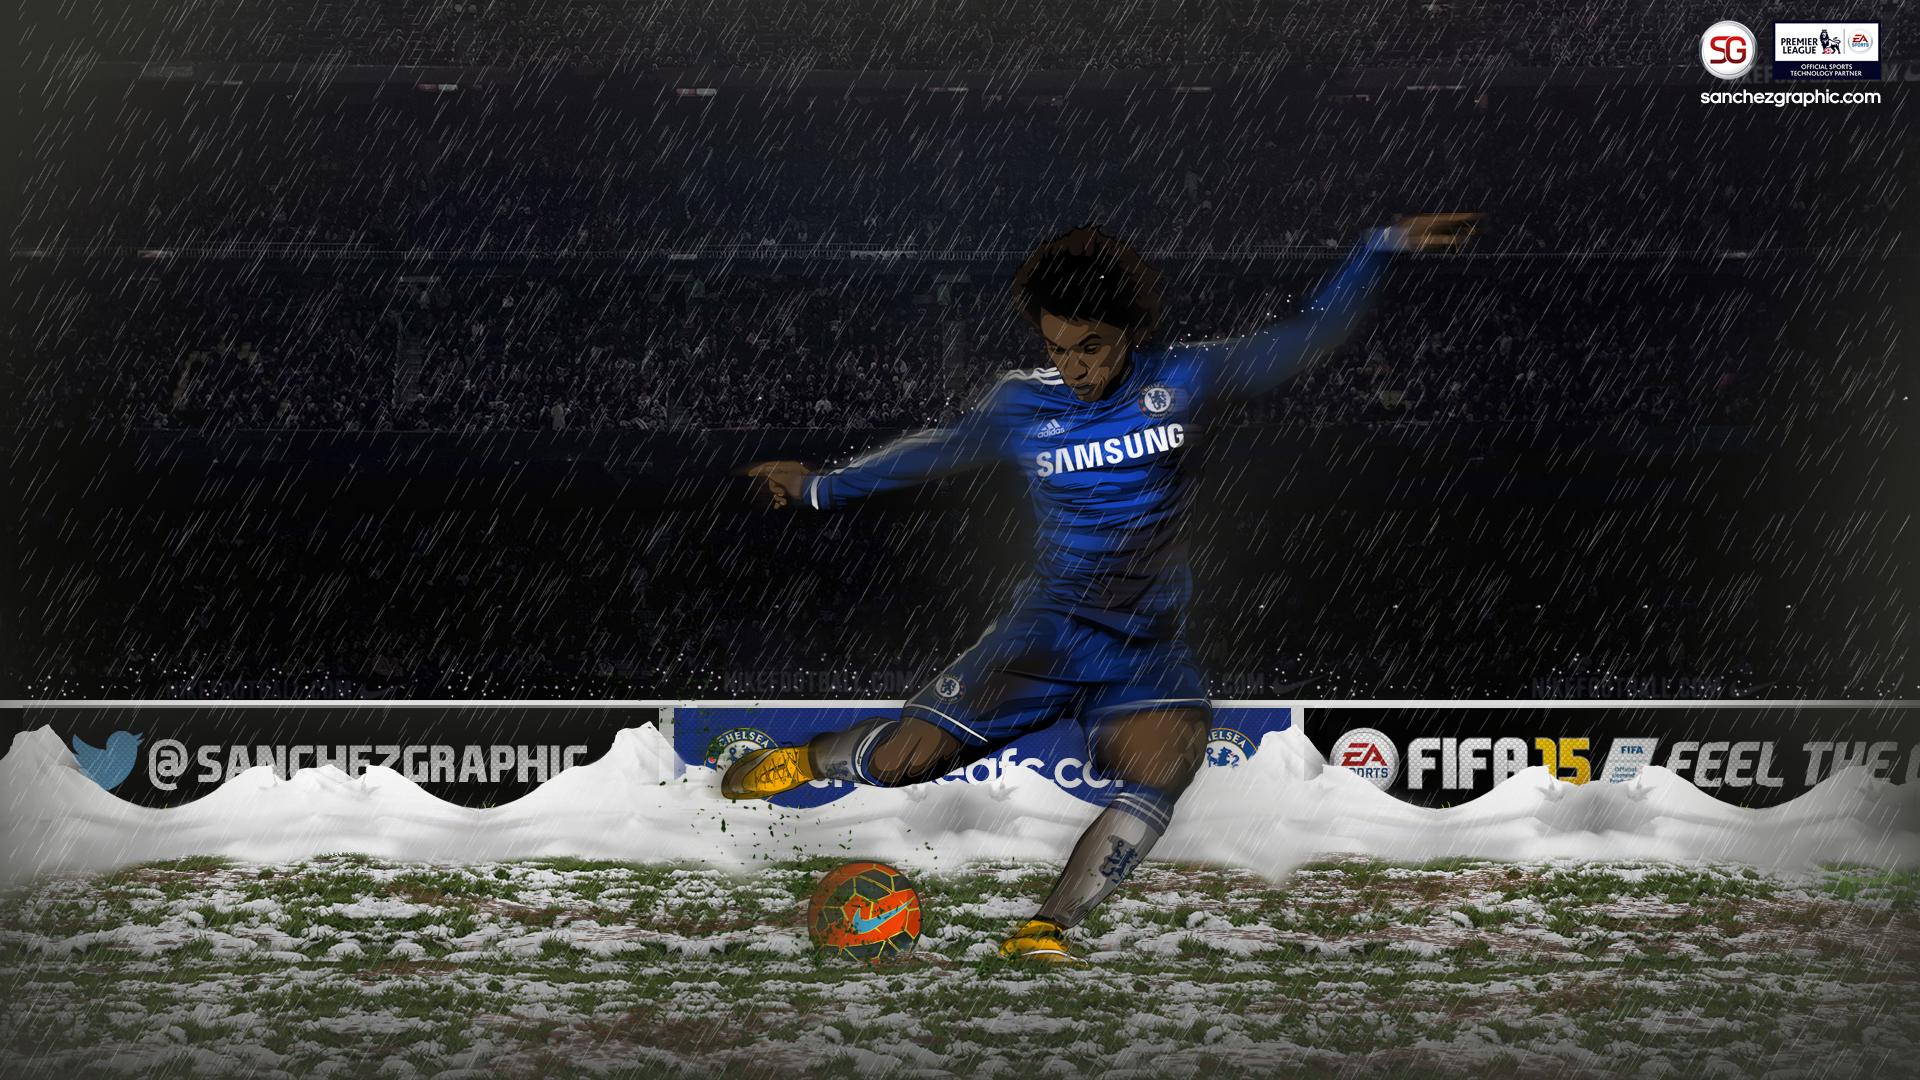 General 1920x1080 Sanchez Graphics  Chelsea FC men rain artwork soccer sport  sports soccer ball